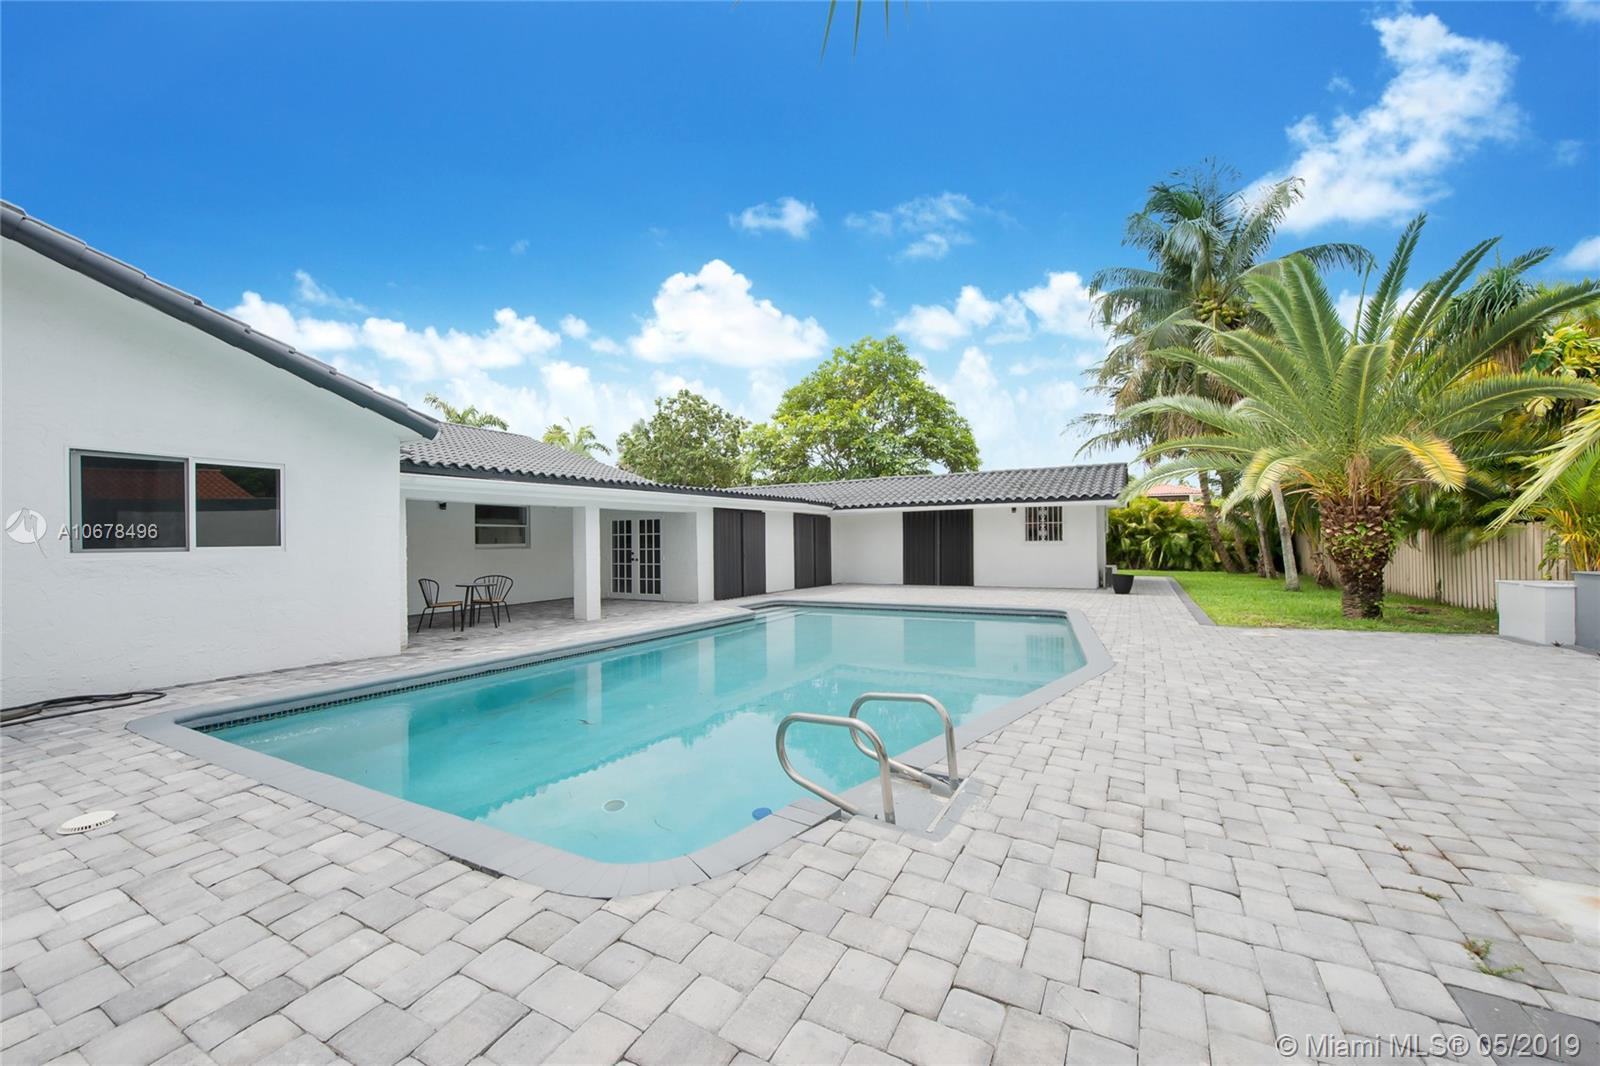 30 SW 132ND AVE, Miami, FL 33184